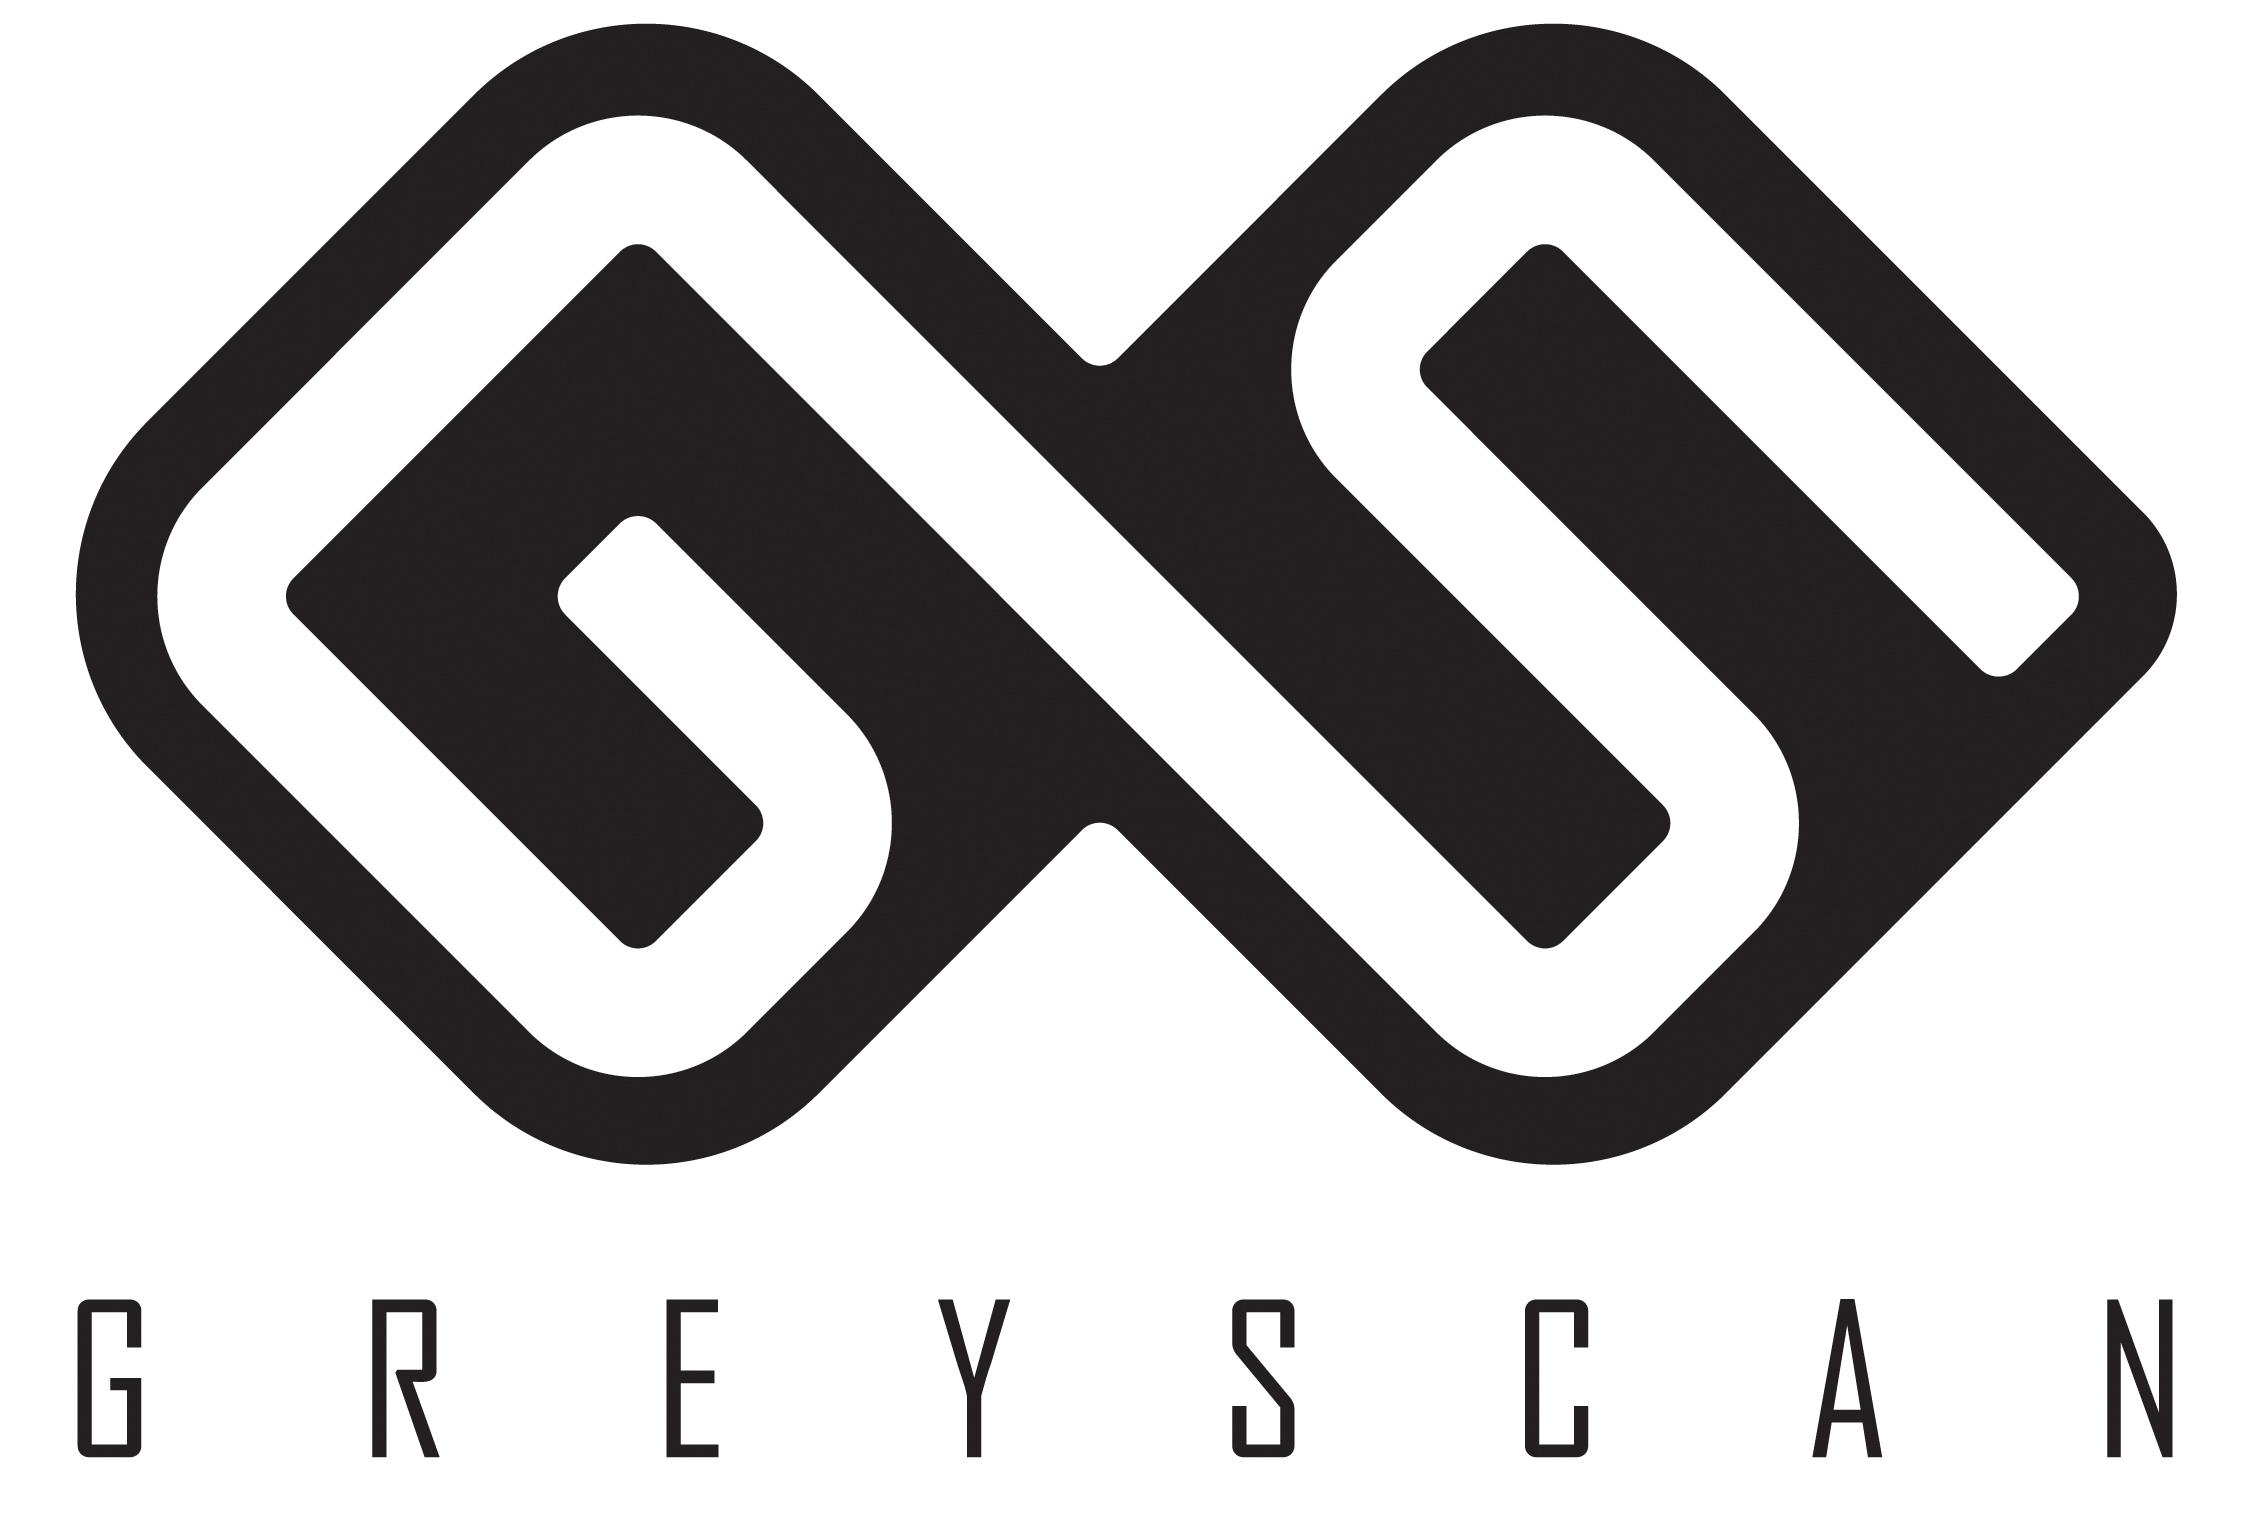 GSN-1518-0041-A-Greyscan logo